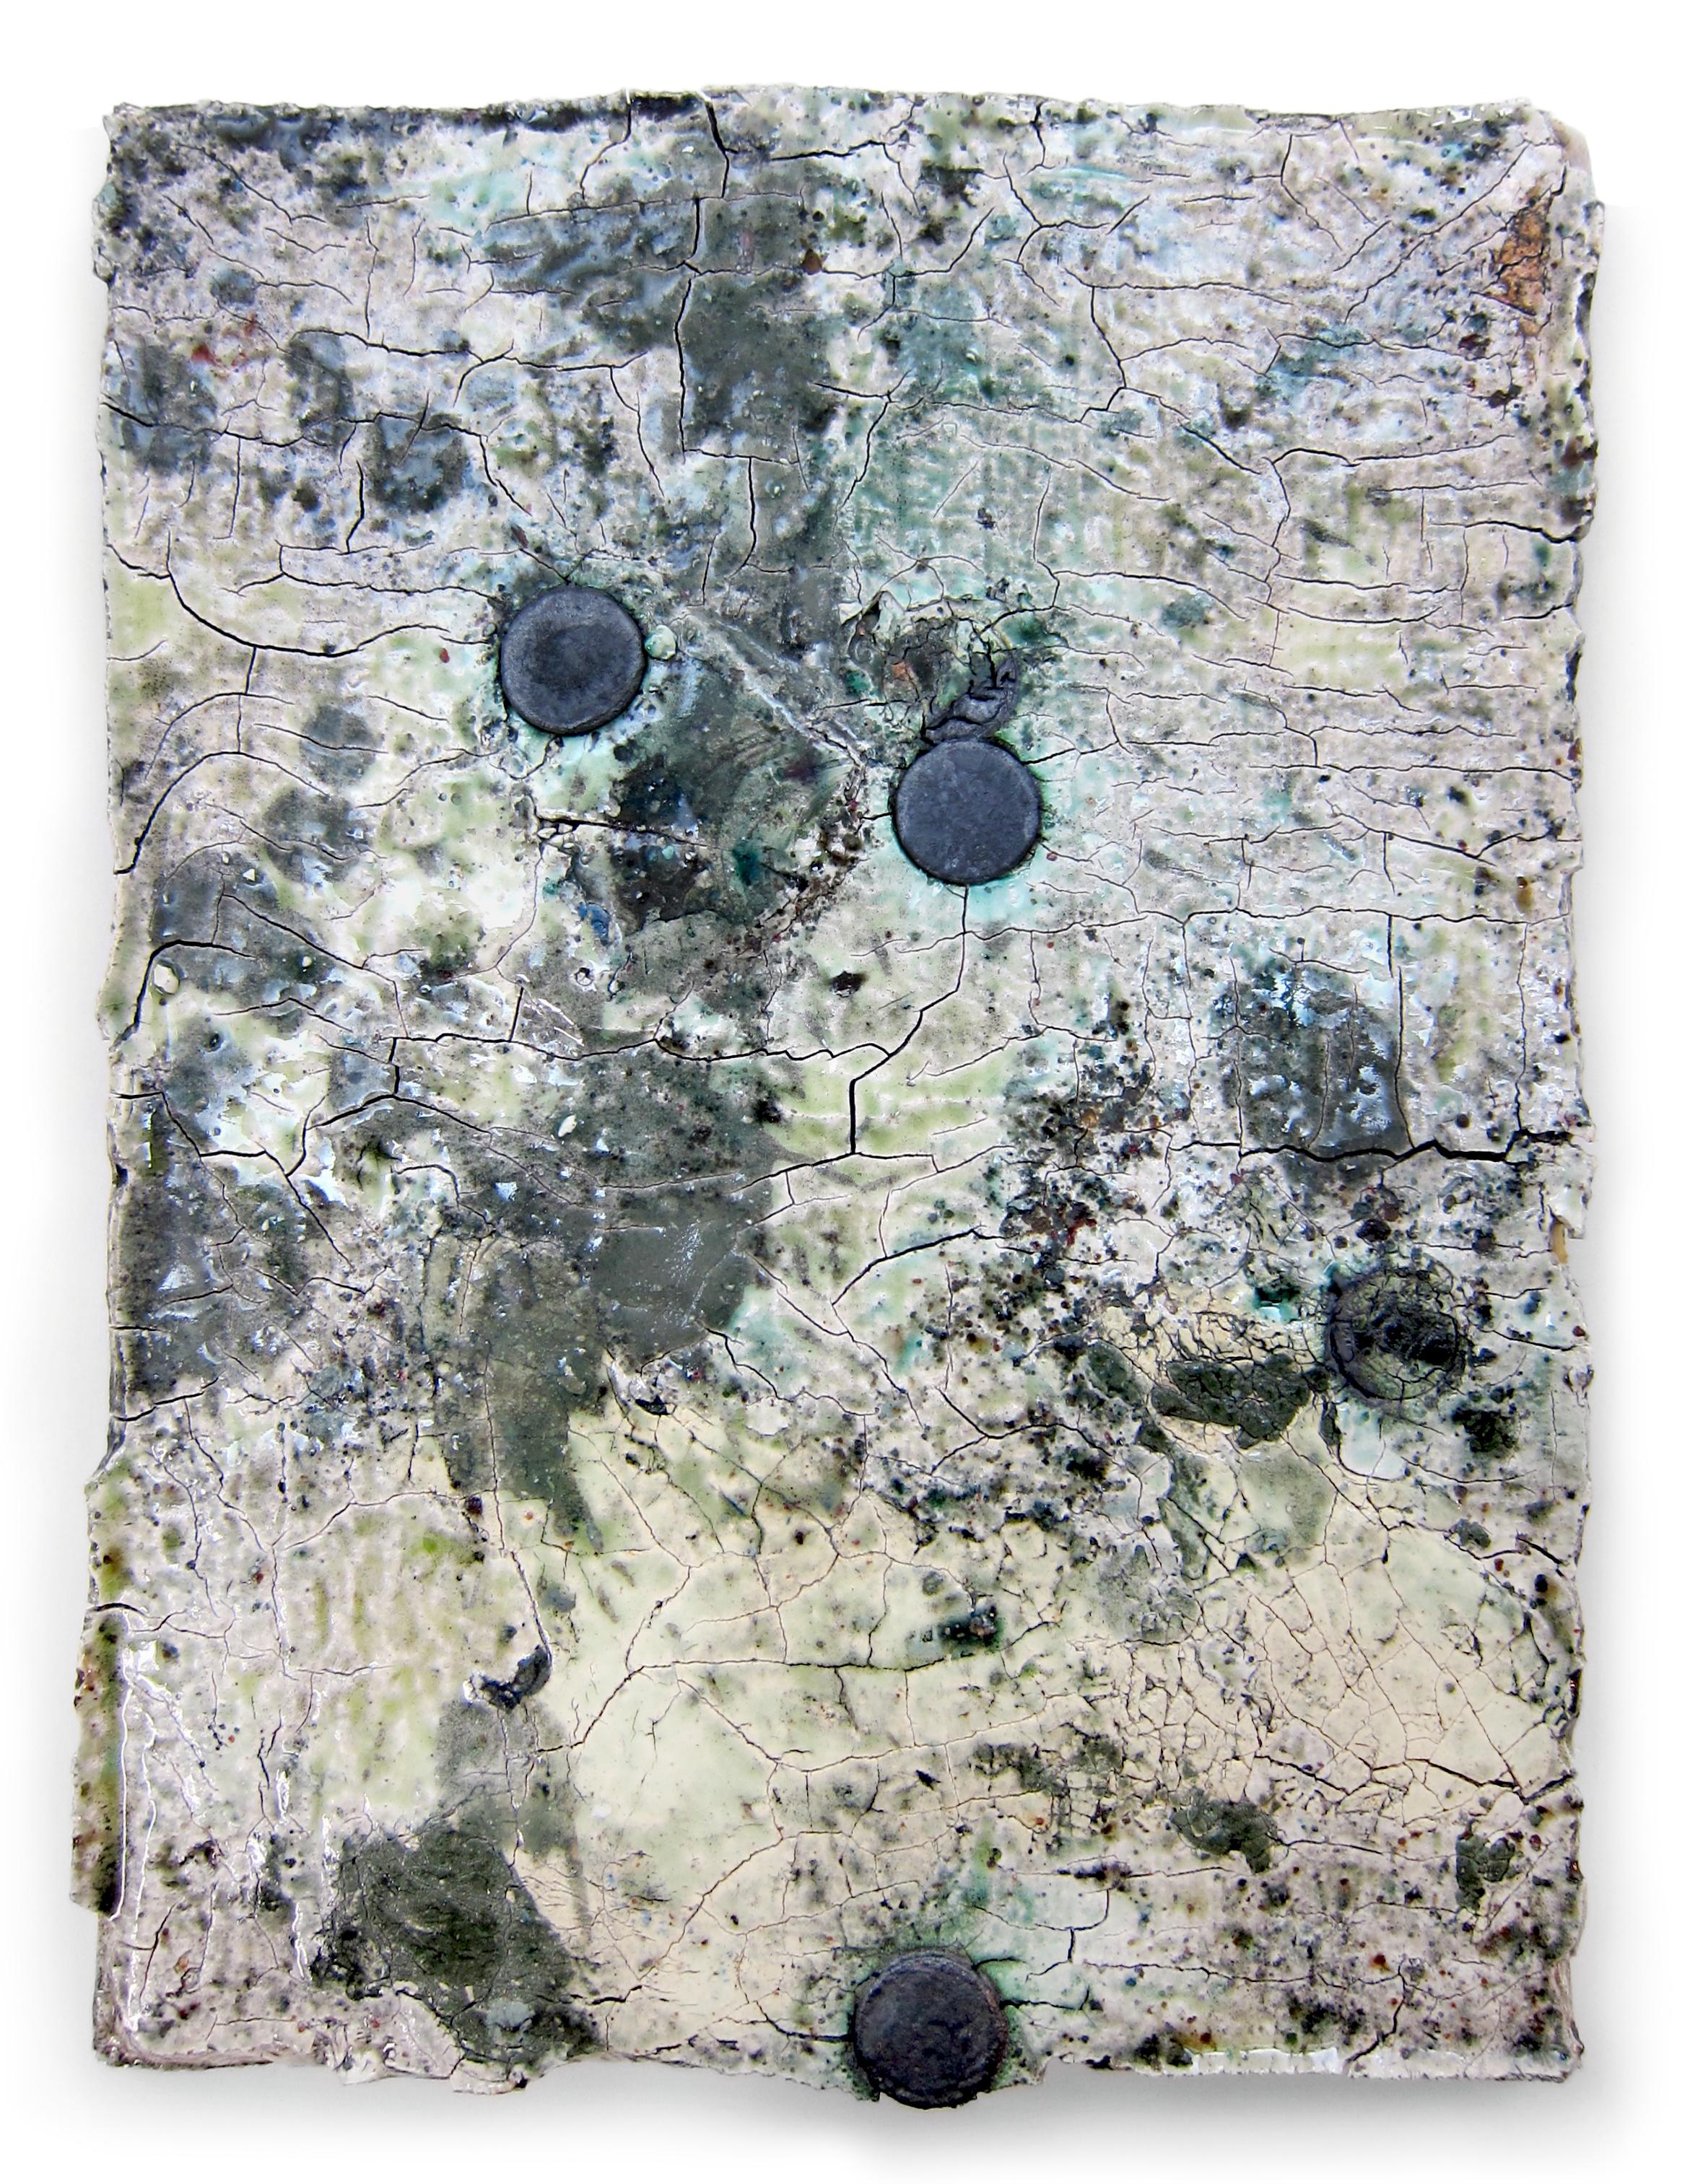 Reclaim Slab No. 8 (wall object)